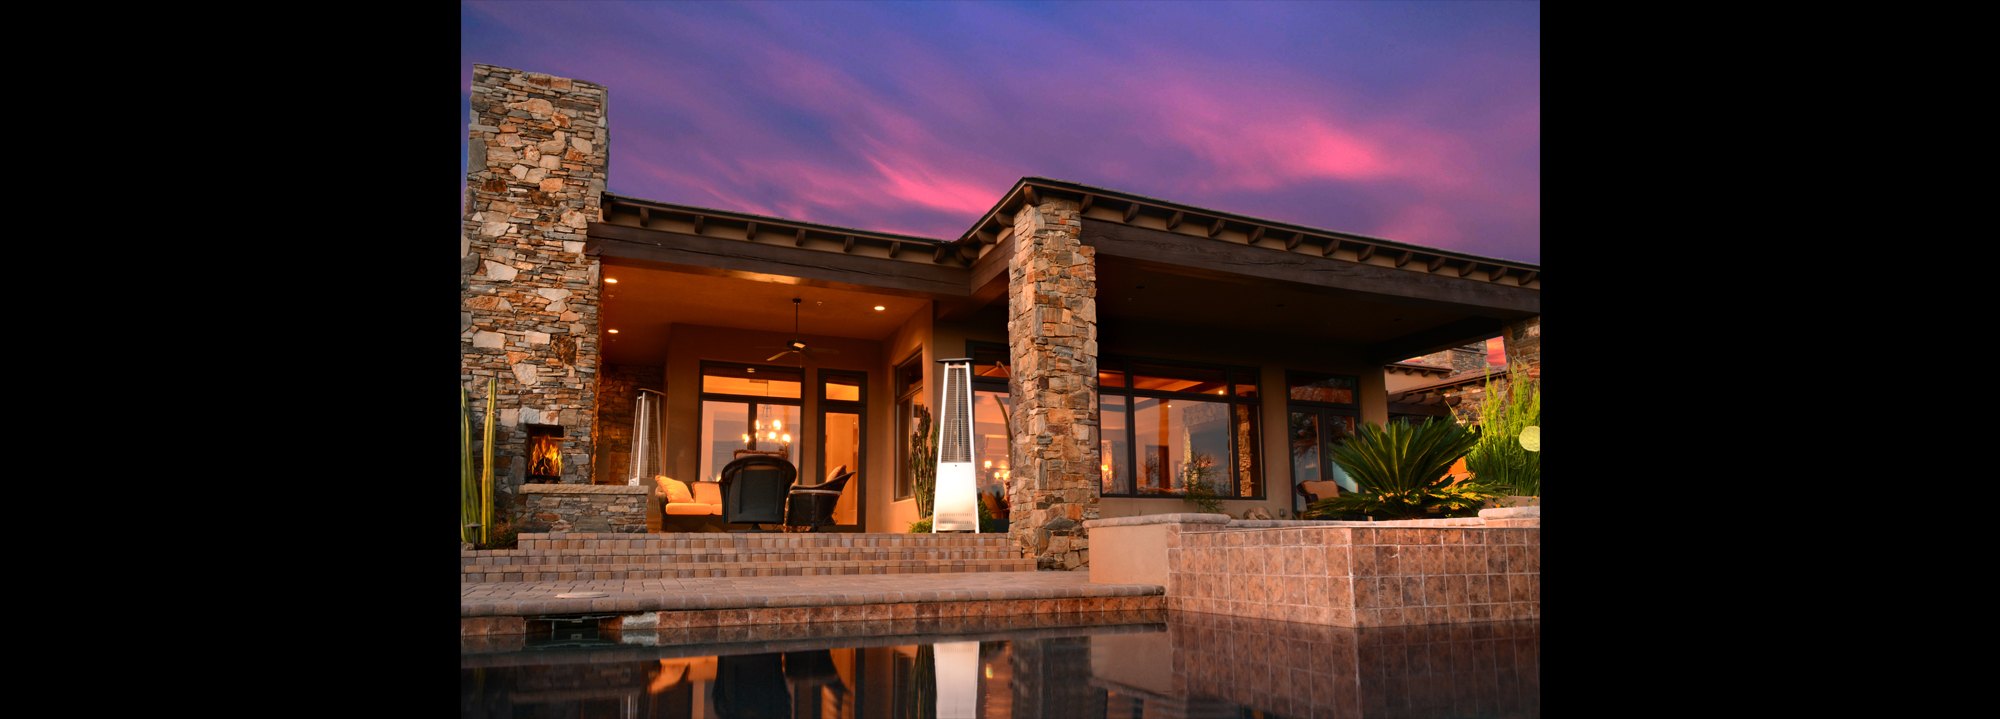 Real Estate - Weecks Productions, LLC